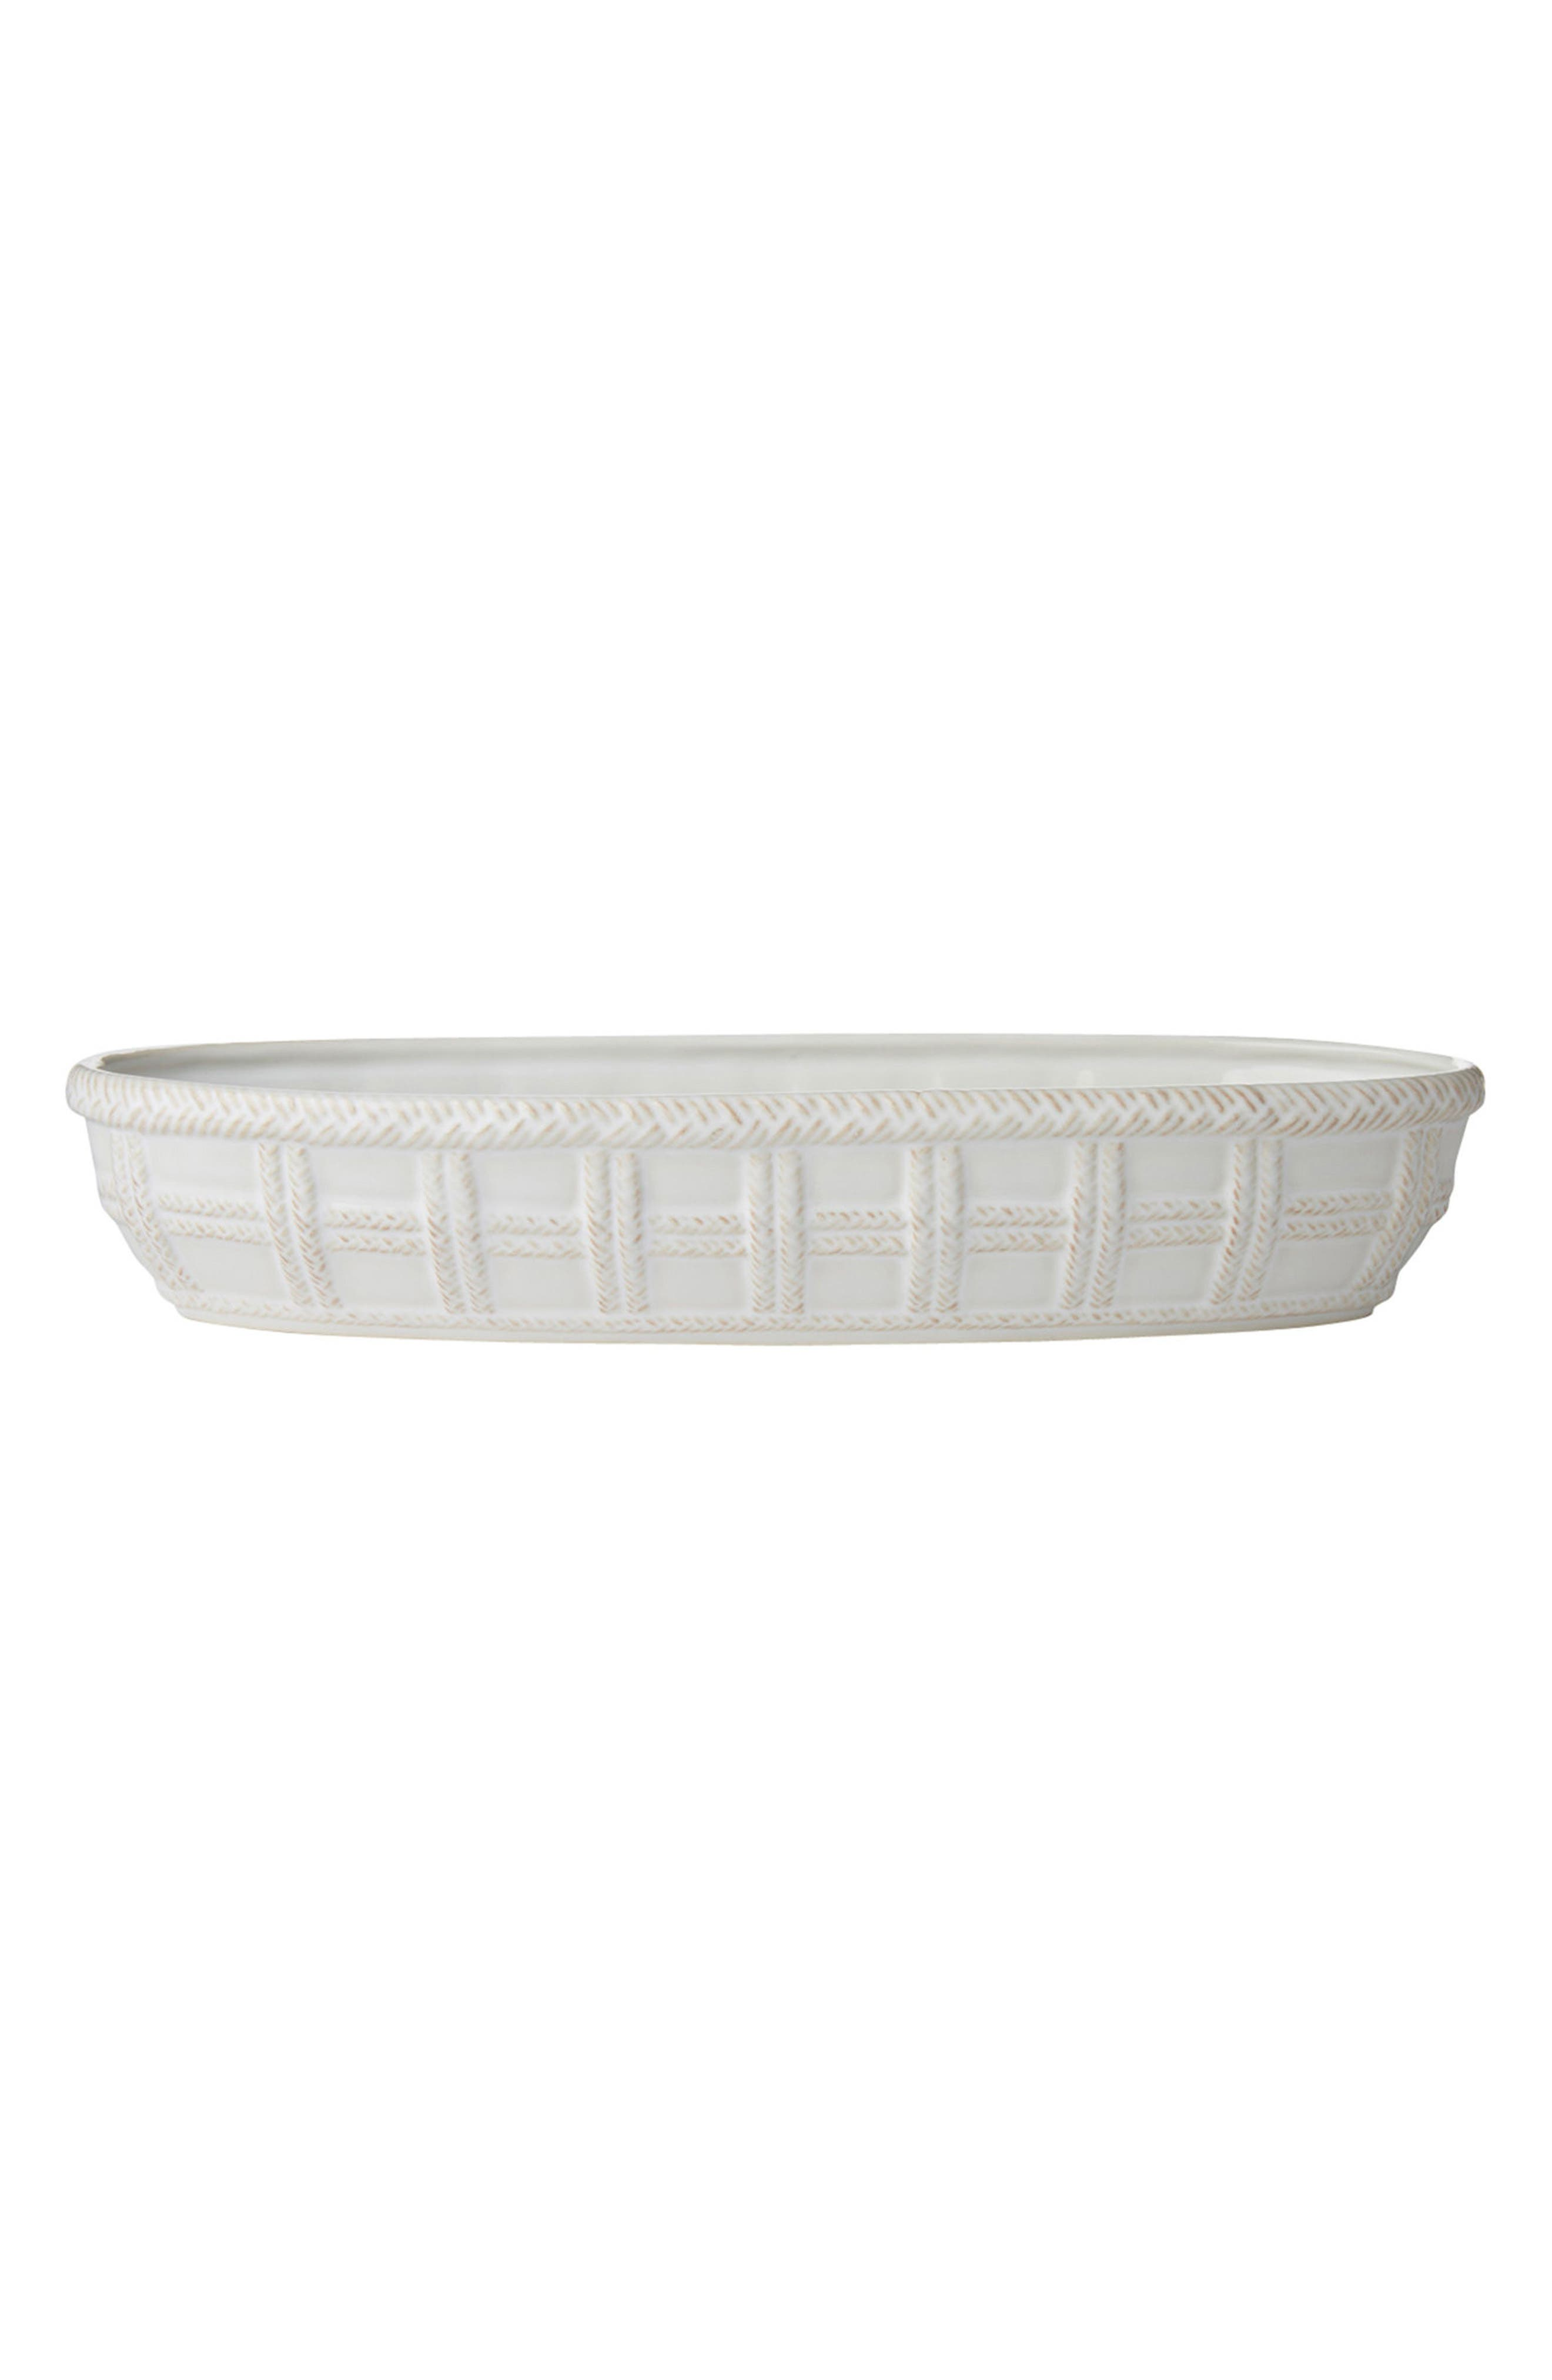 Le Panier Ceramic Bread Basket,                         Main,                         color, WHITEWASH